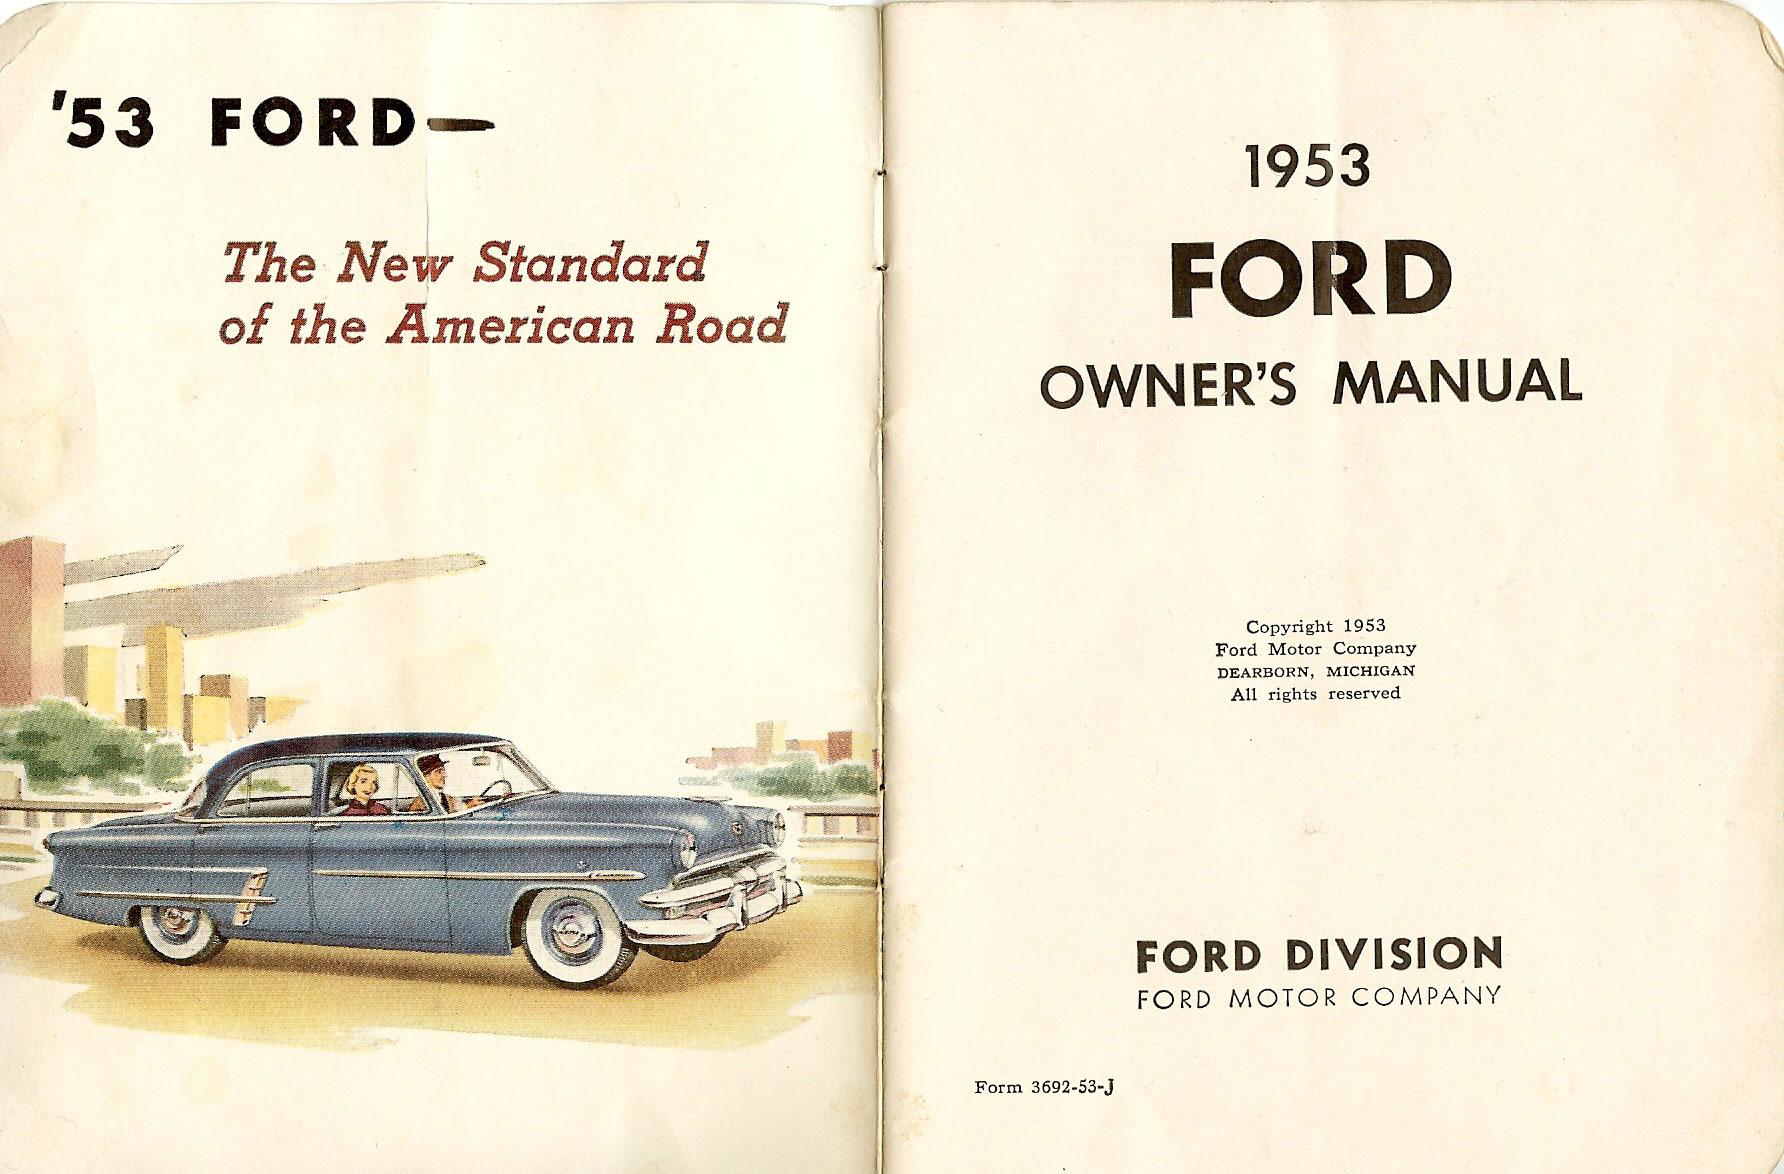 rethinking software documentation rh hildeberto com ford user manual parallel park assist ford user manual focus